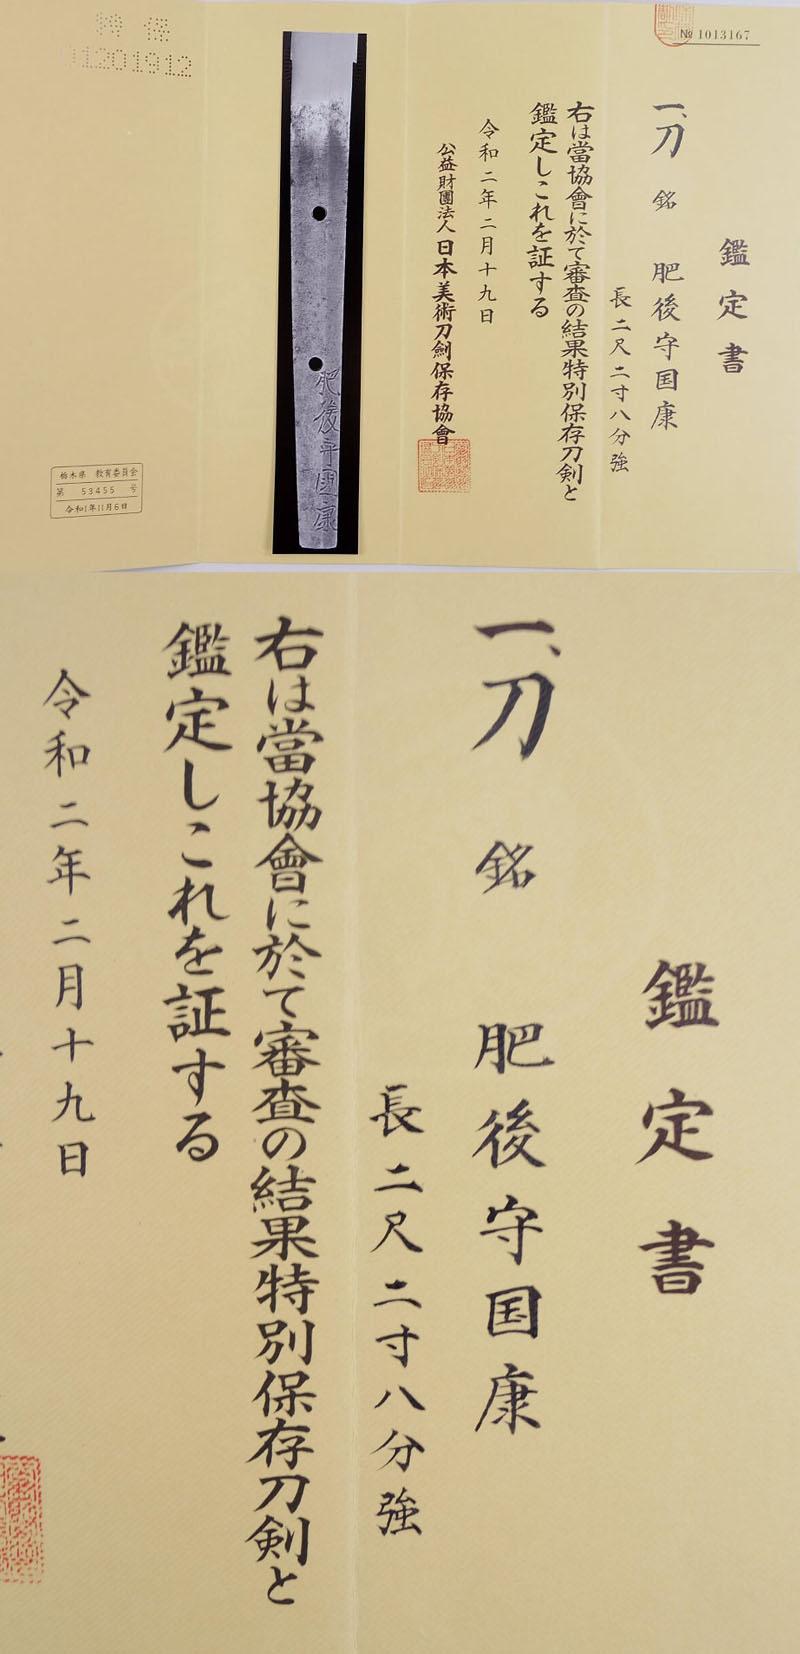 刀 肥後守国康(新刀上作)(大業物) Picture of Certificate